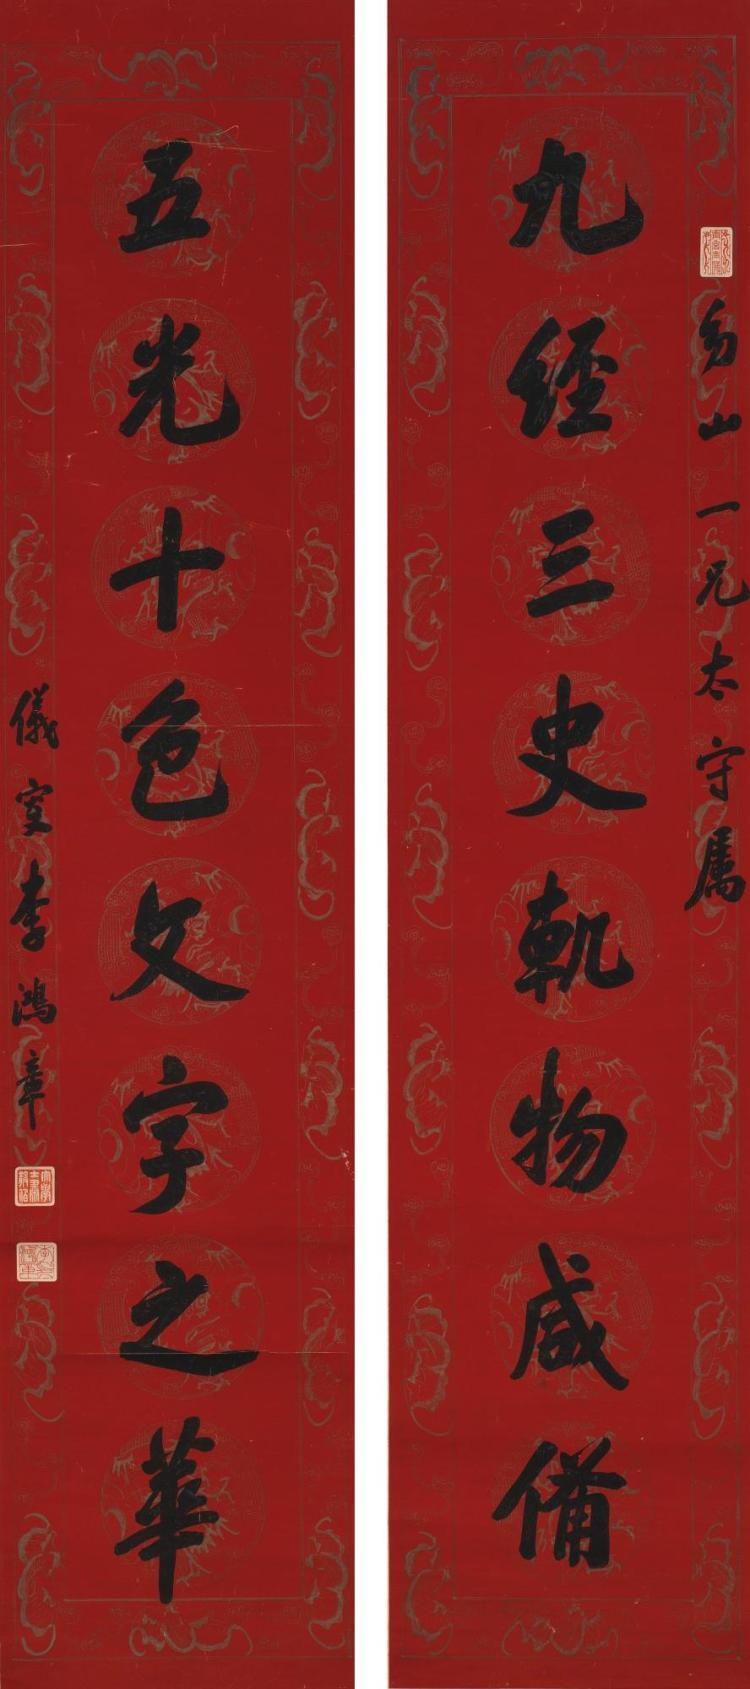 LI HONGZHANG 1823-1901 | CALLIGRAPHY COUPLET IN RUNNING SCRIPT